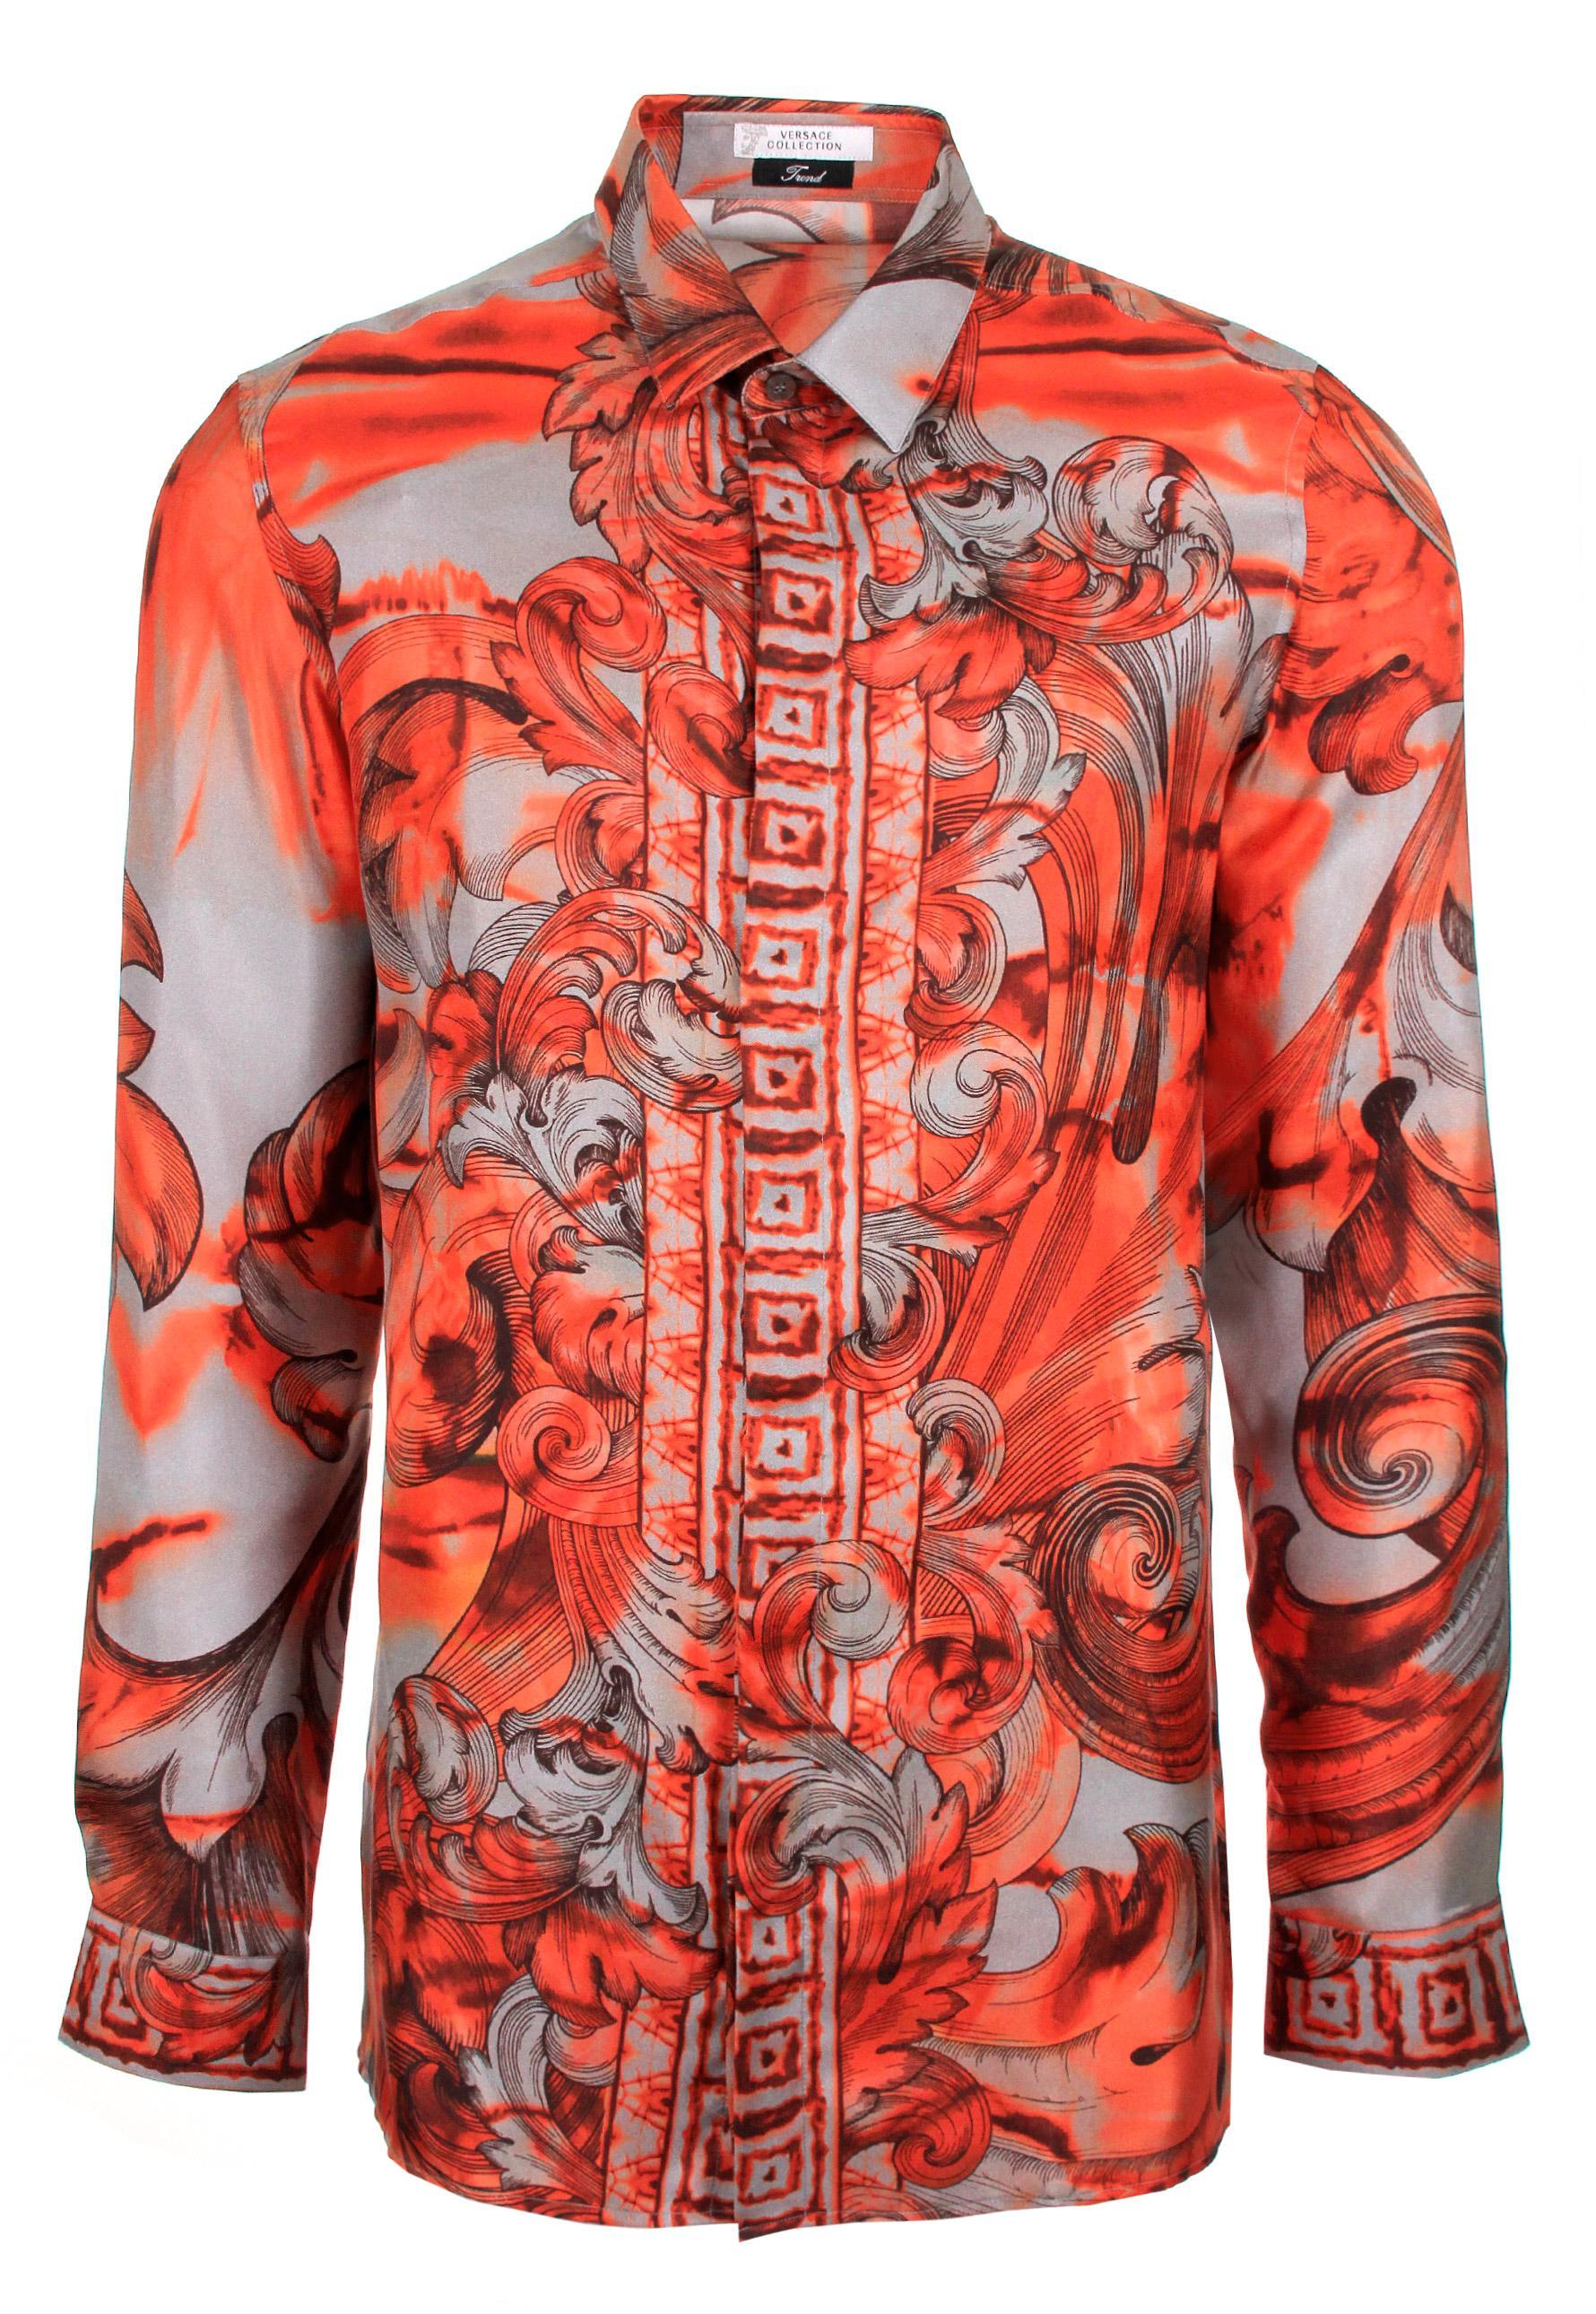 c434ca8f Versace Tie And Dye Baroque Hand Painted Silk Shirt Orange in Orange ...